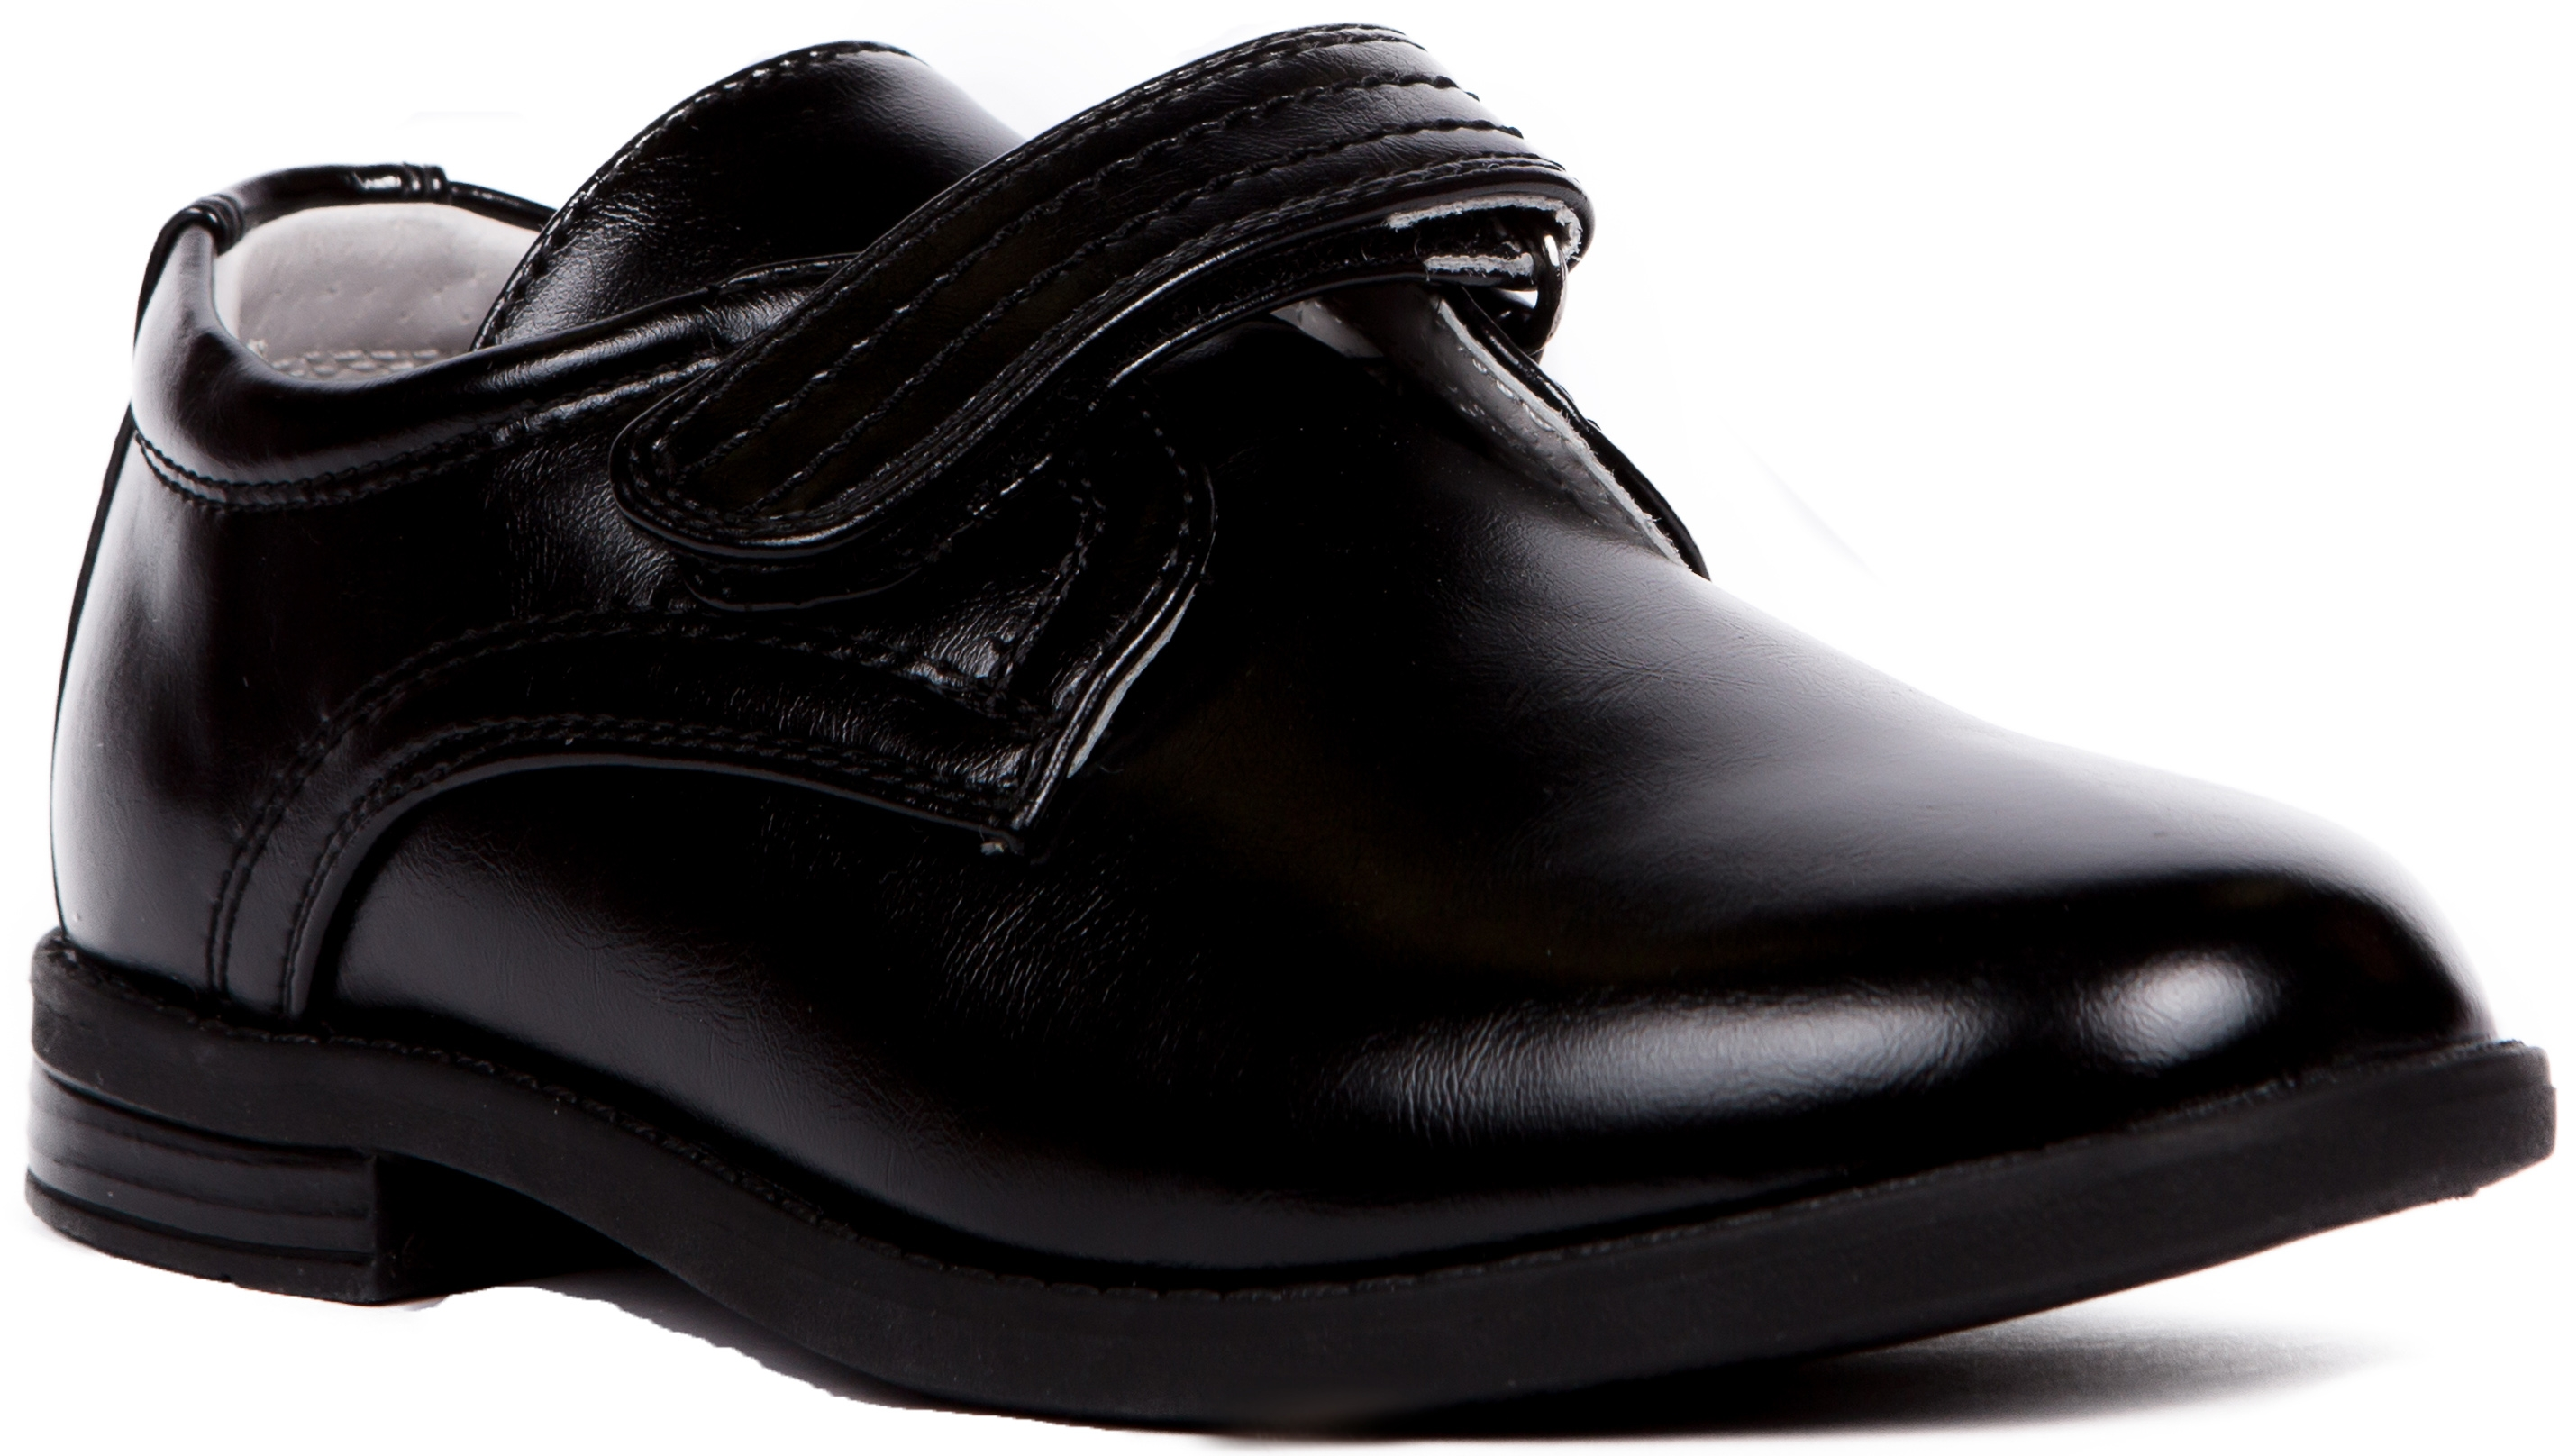 Ботинки и полуботинки Barkito Полуботинки для мальчика Barkito, черные ботинки для мальчика reima черные